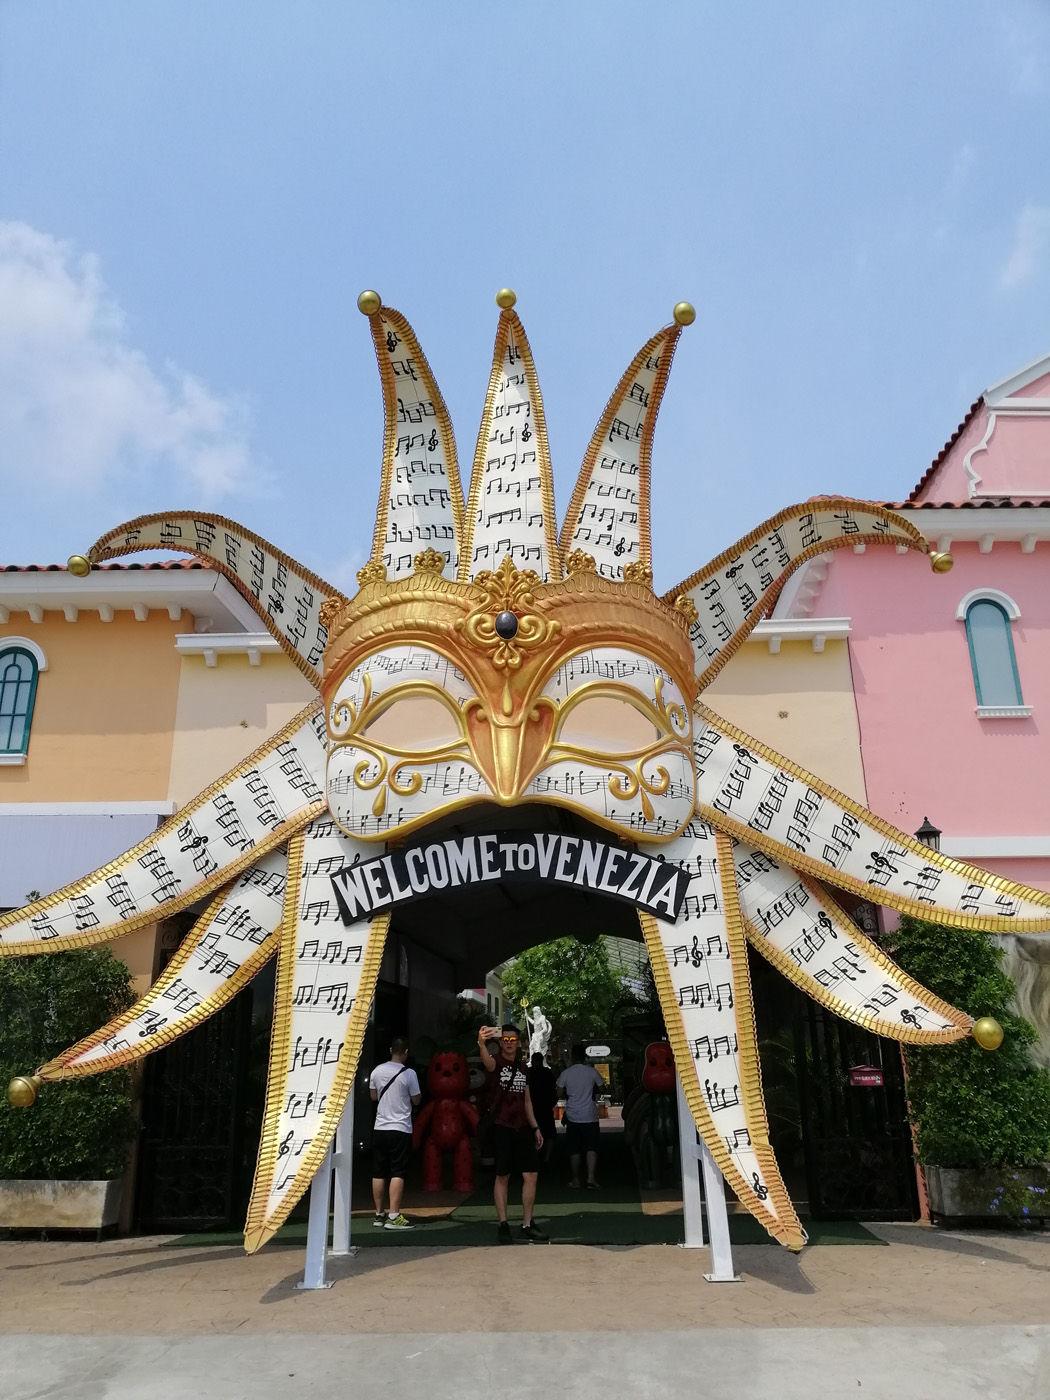 The Venezia Entrance